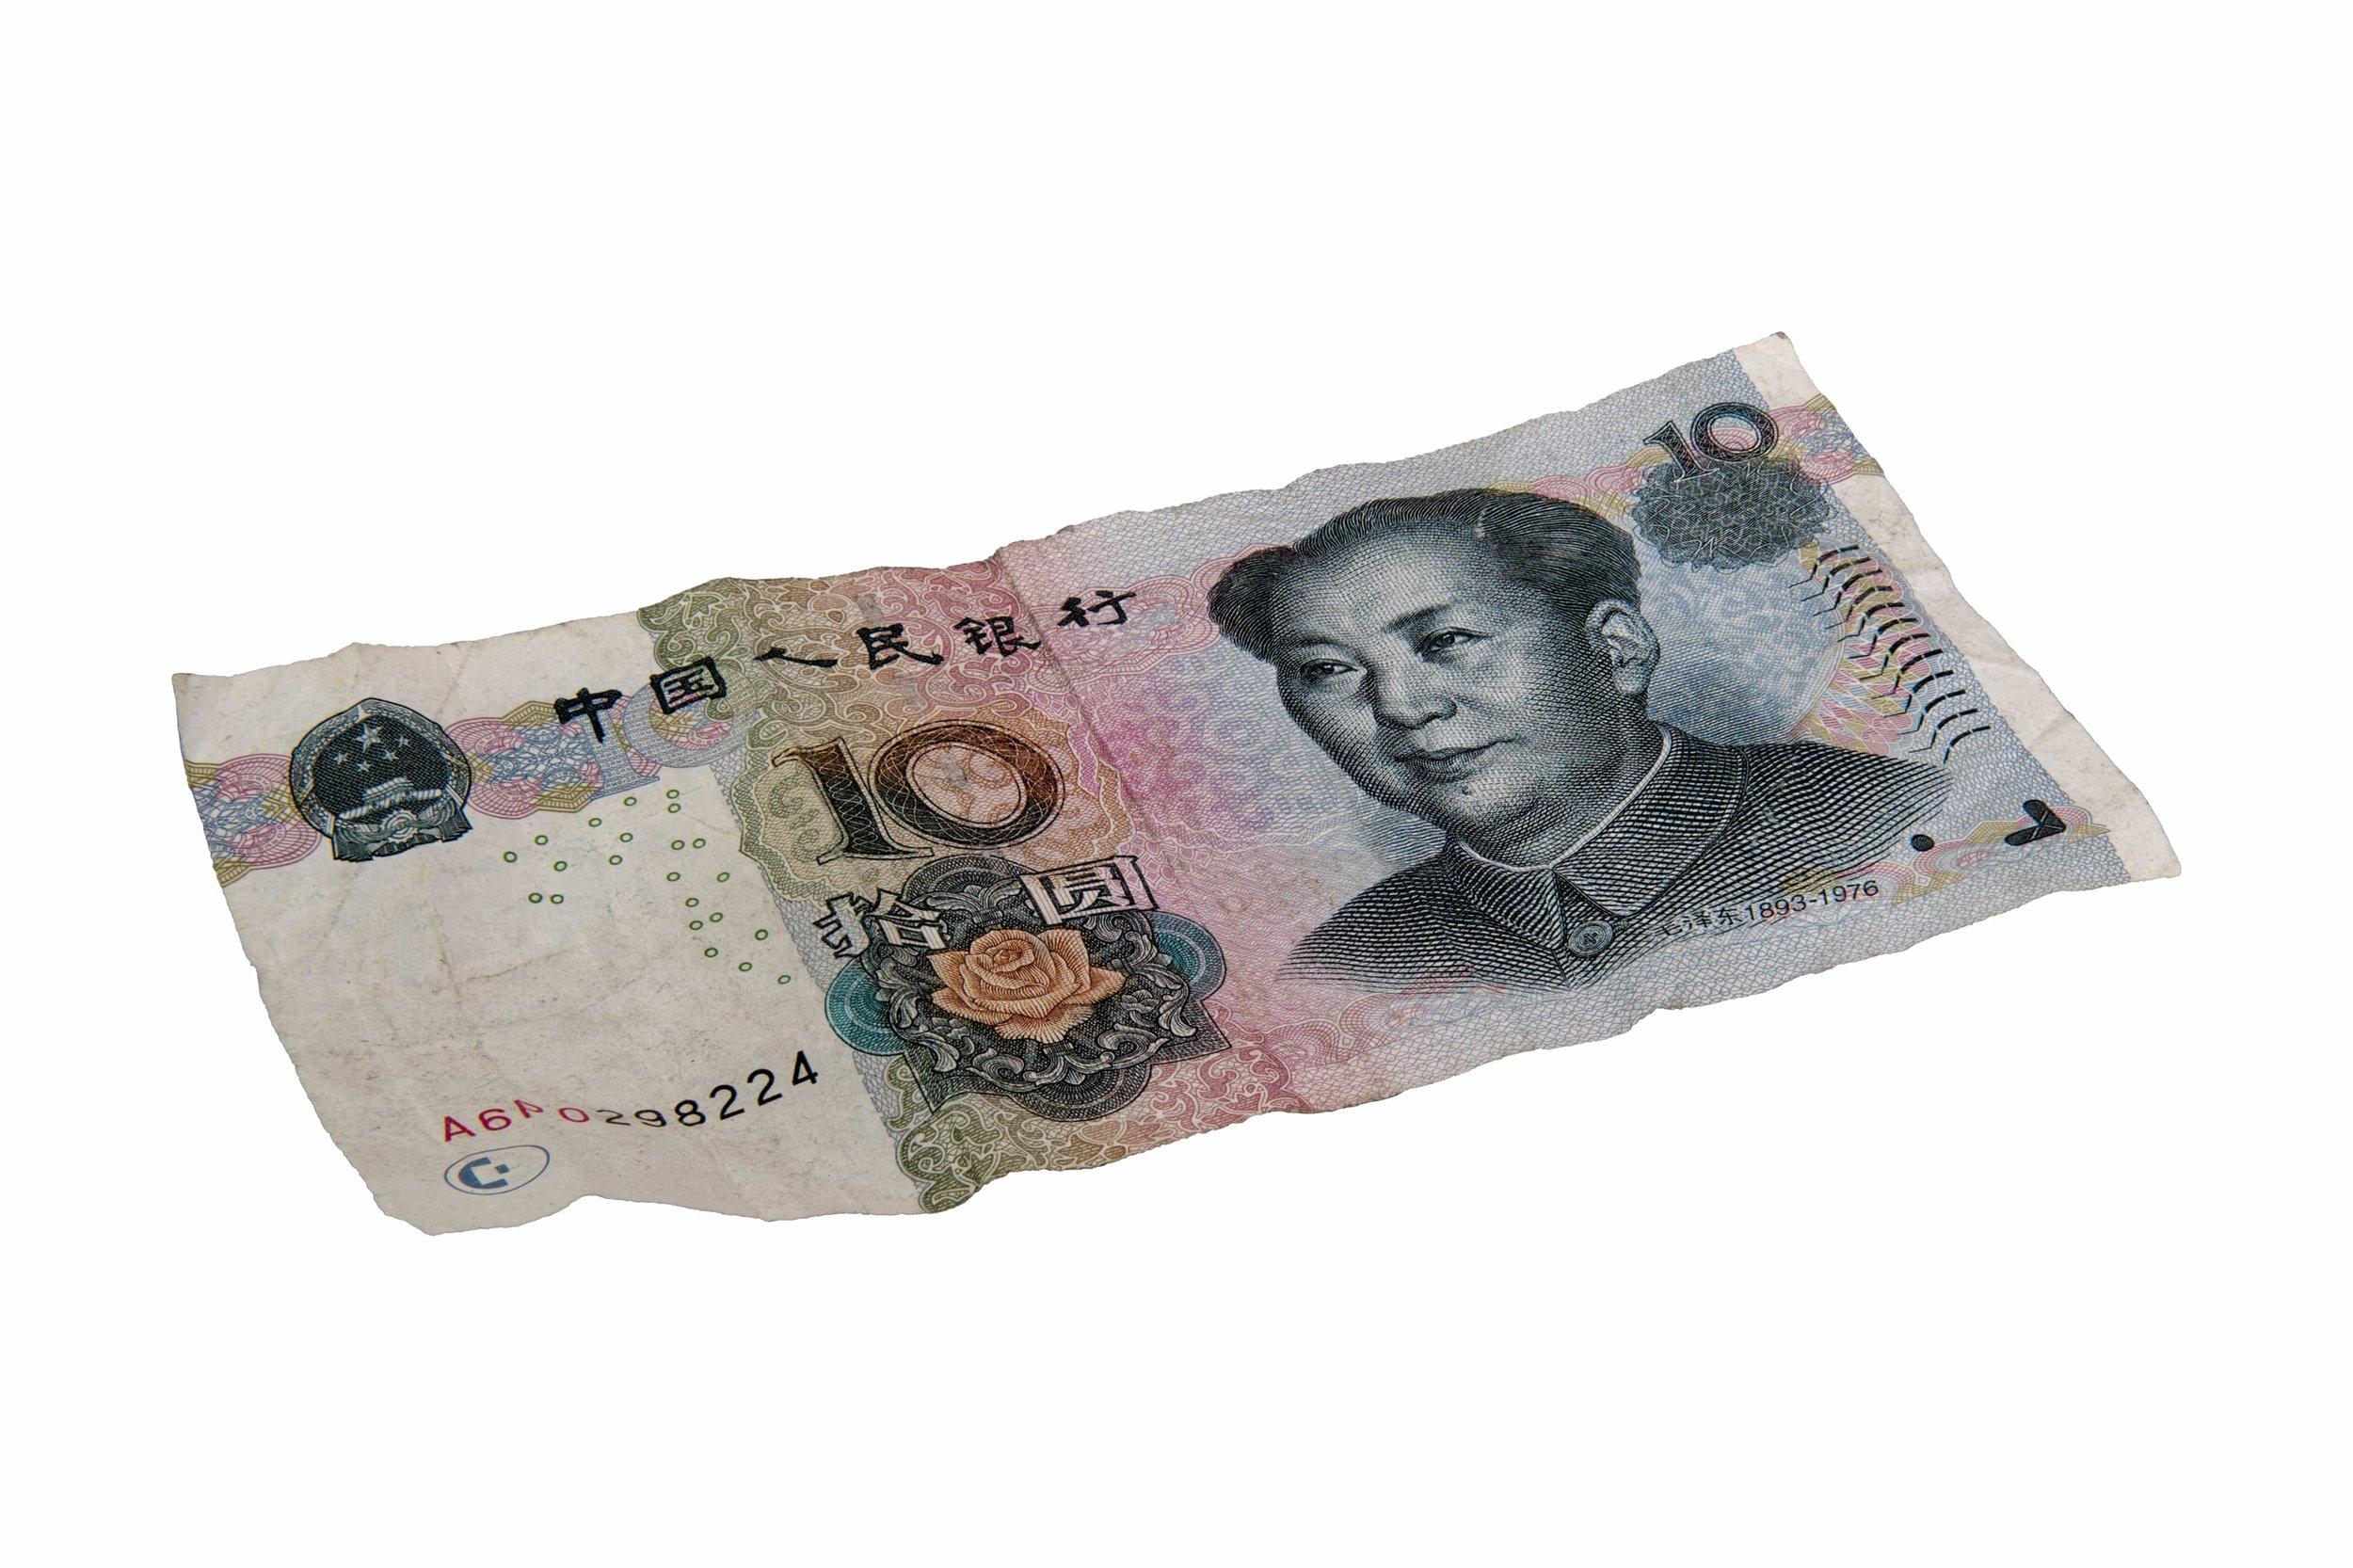 10-yuan-china-banknote-on-a-white-background-PZ77EYY-min.jpg